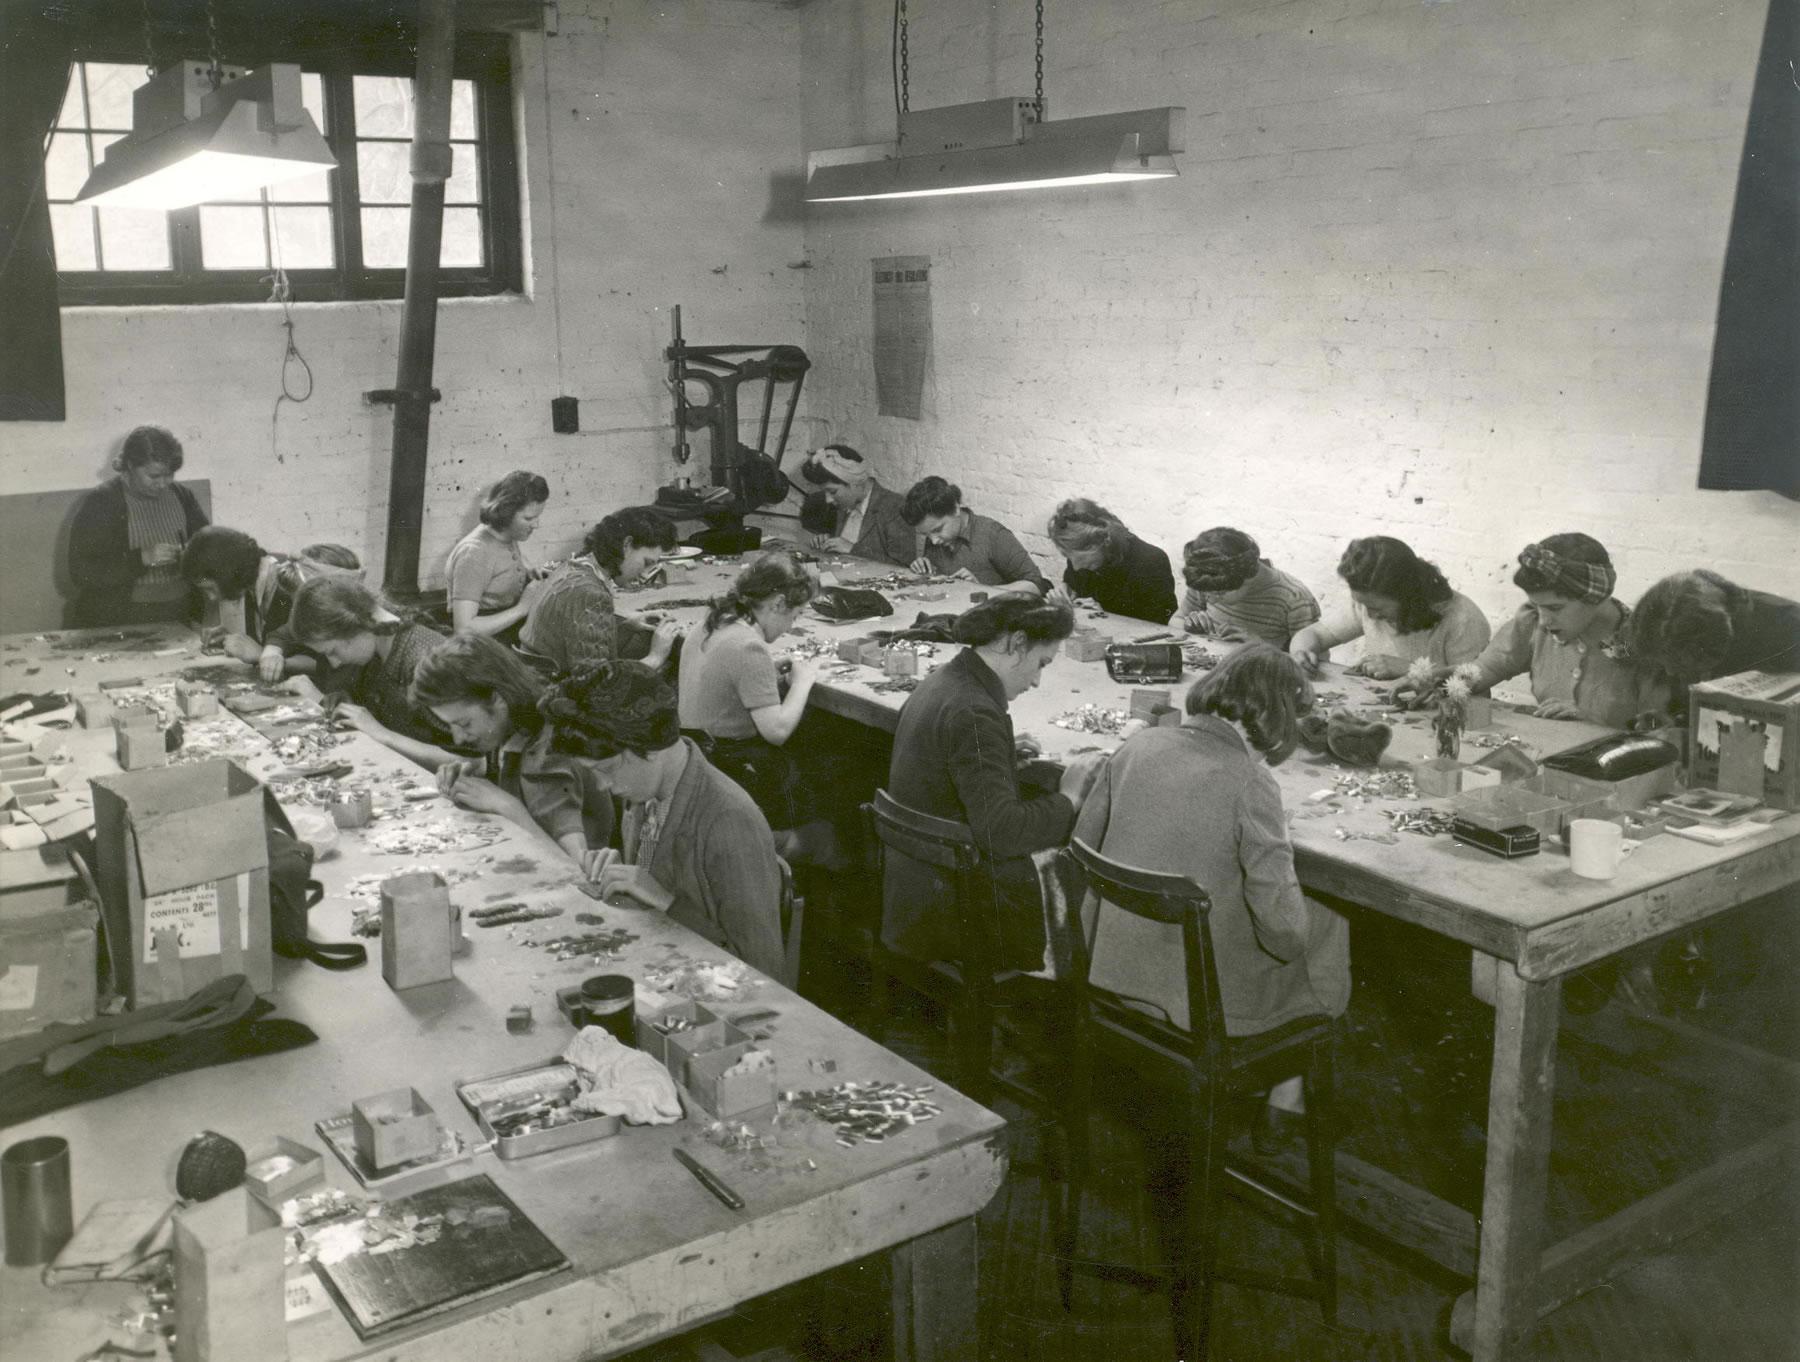 Elmbridge Museum Esher Commemorates VE Day Anniversary With Blitz Exhibition, Workshop & Talk